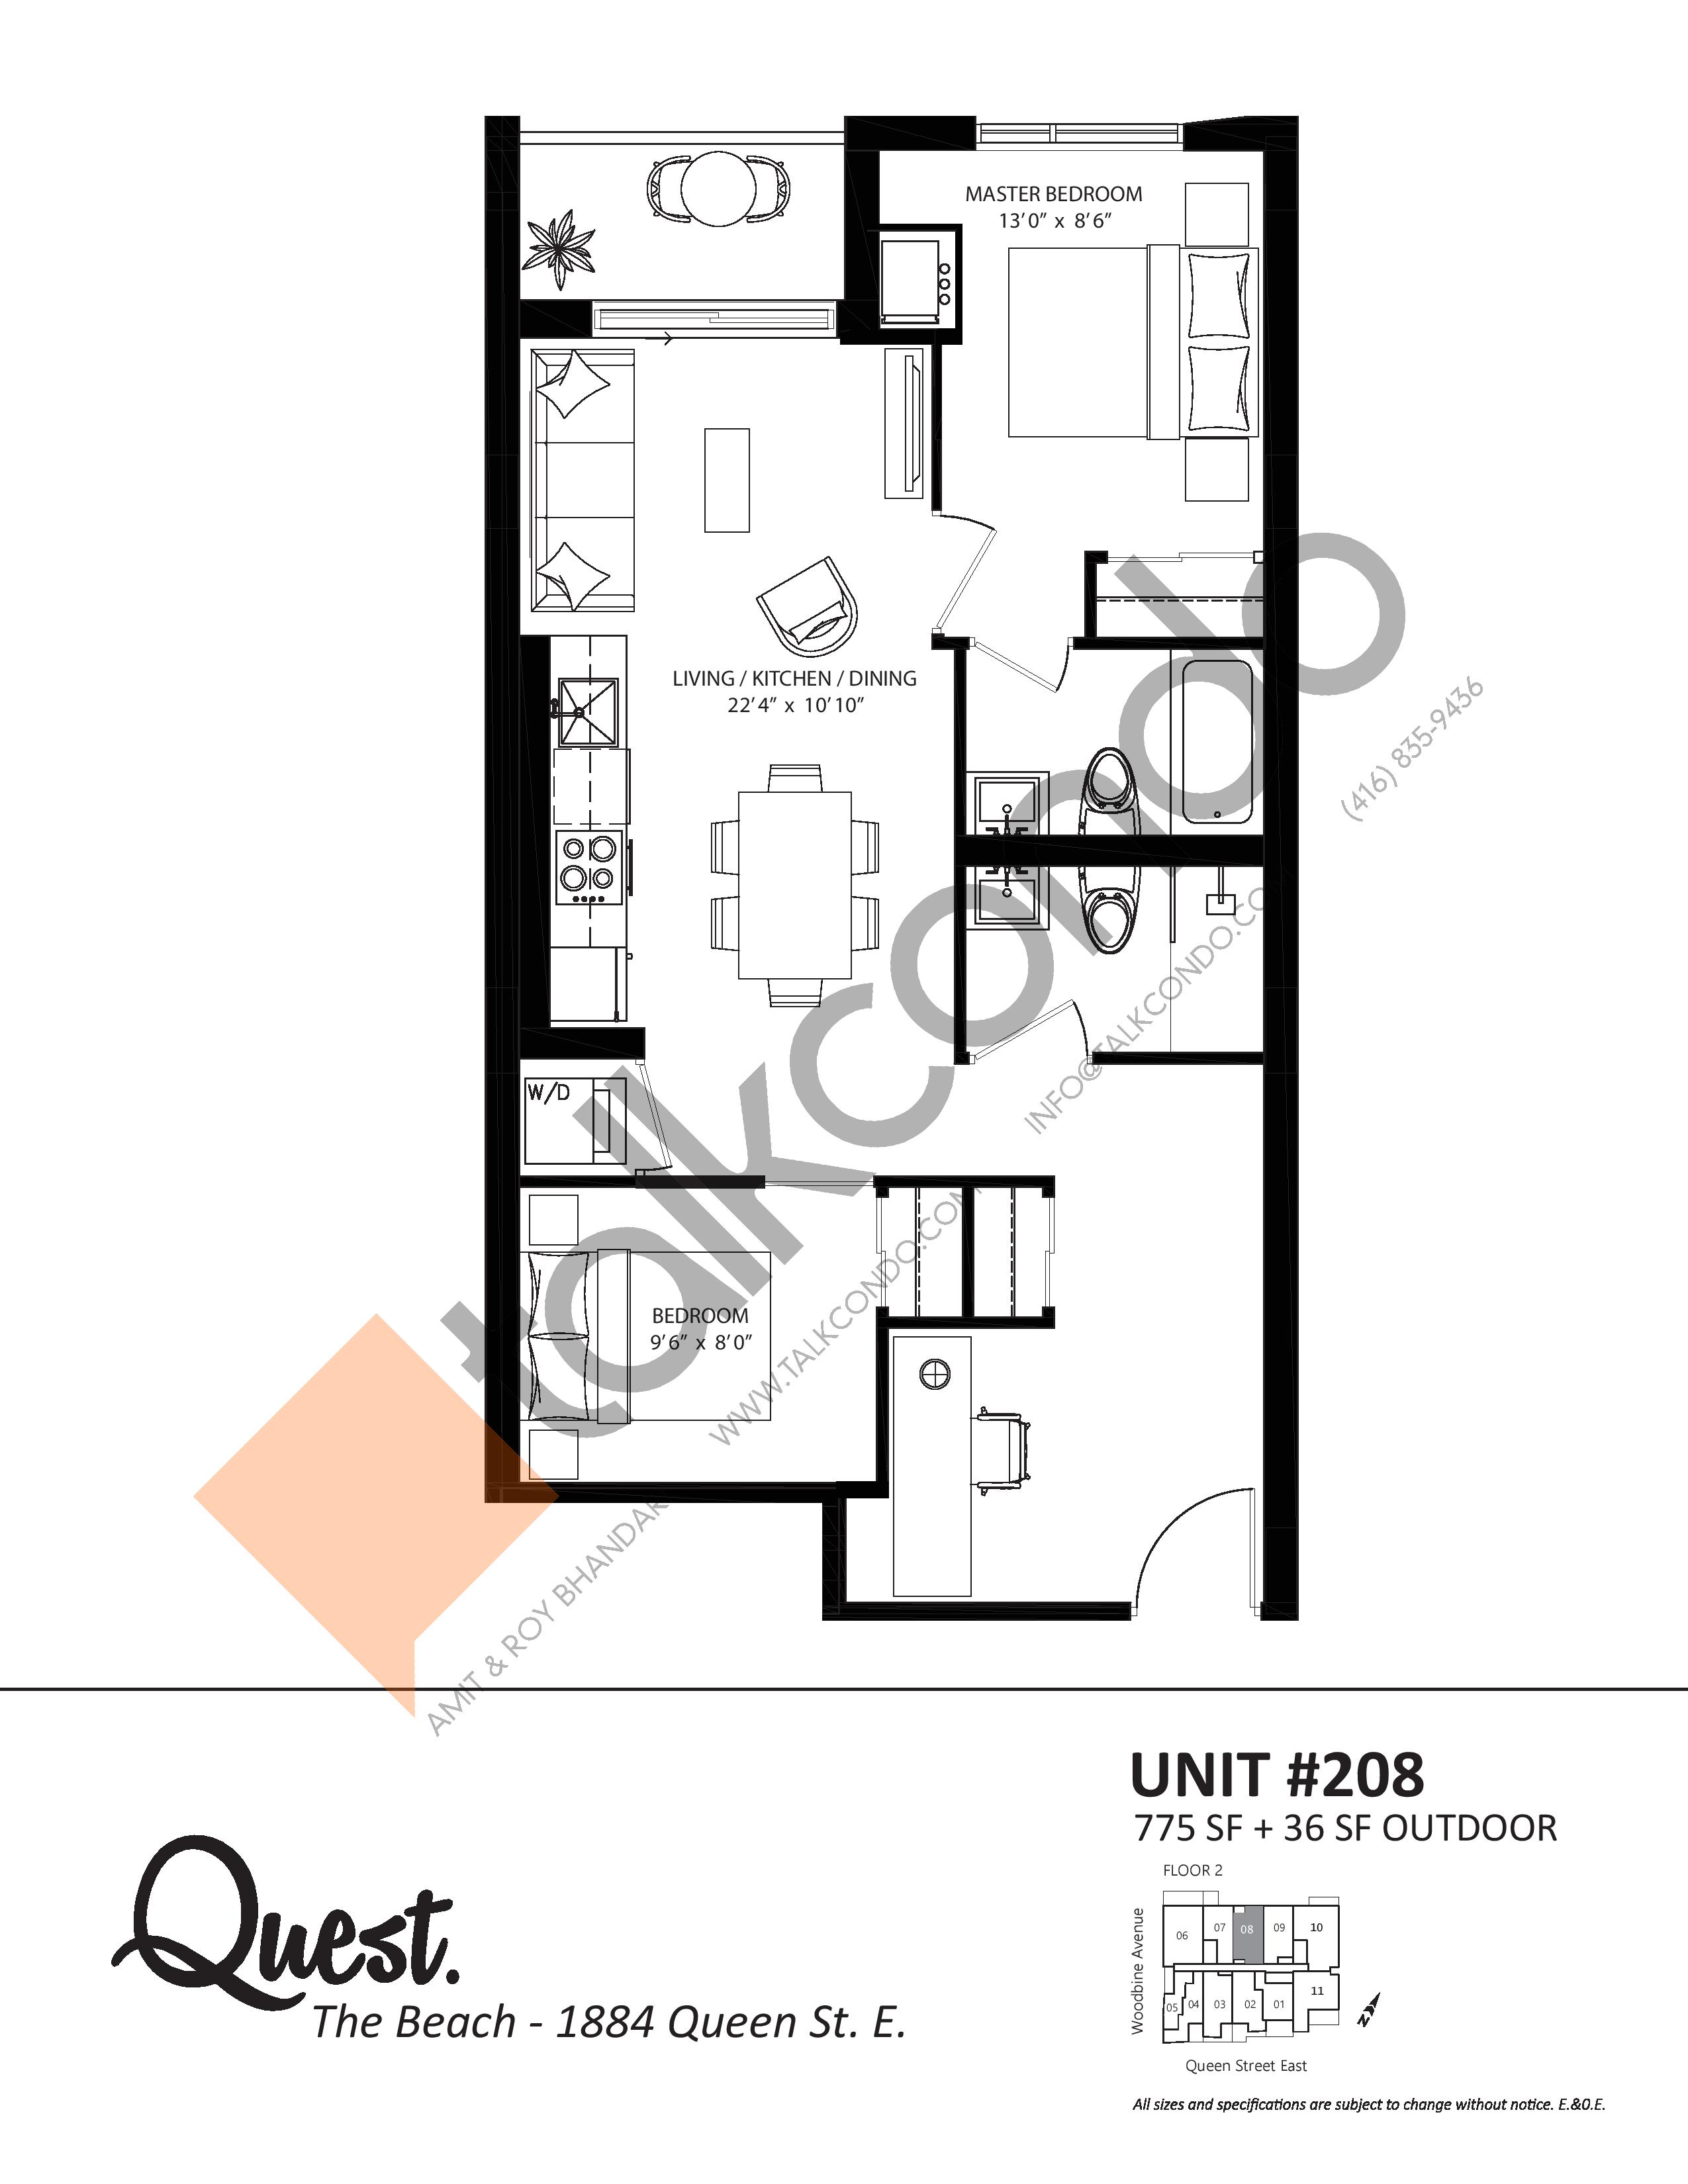 Unit 208 Floor Plan at Heartwood the Beach Condos - 775 sq.ft